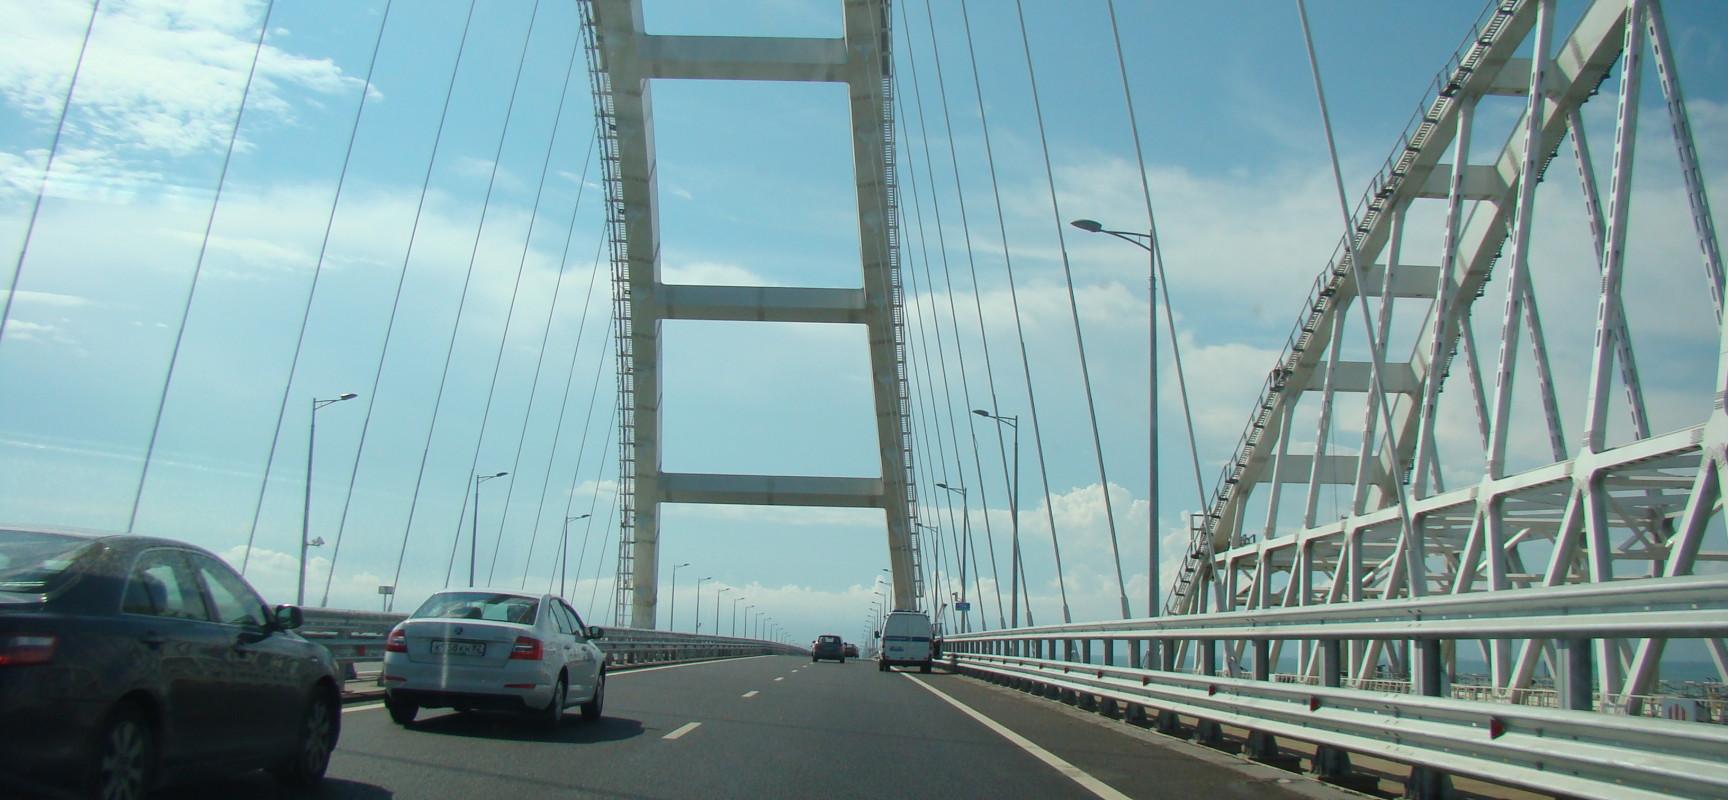 Мост через керченский пролив, летний трафик, статистика